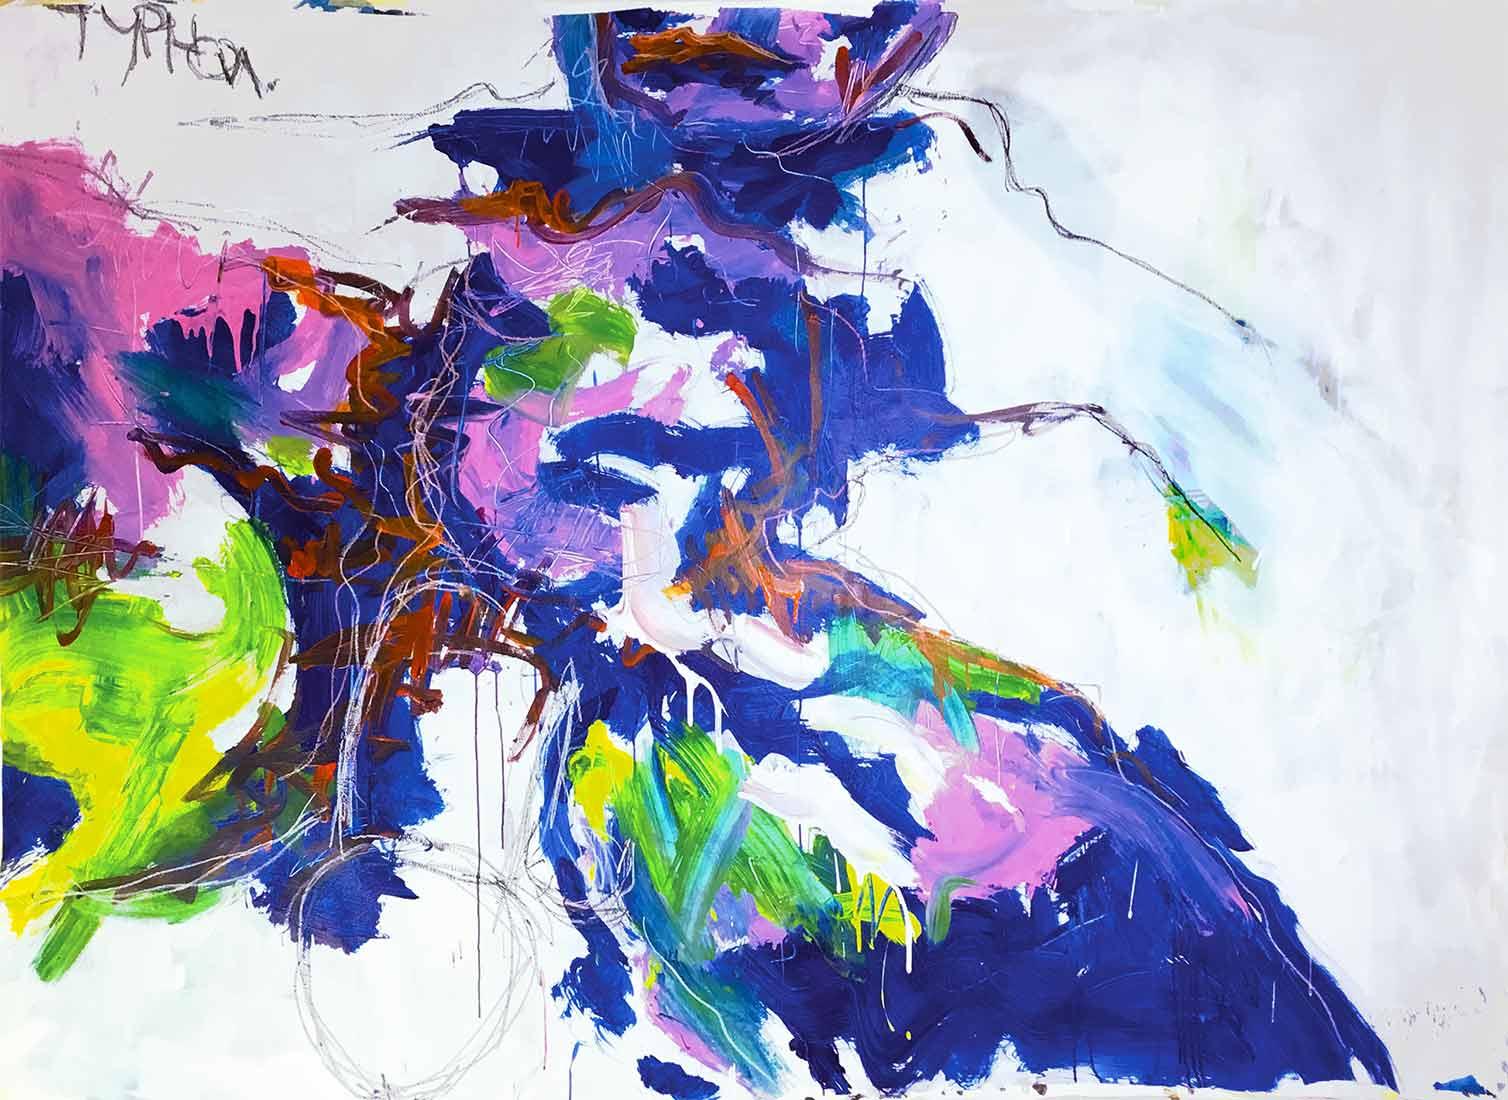 typhon-mongi-higgs-artwork-gemaelde-konsum163-galerie-modern-art-gallery